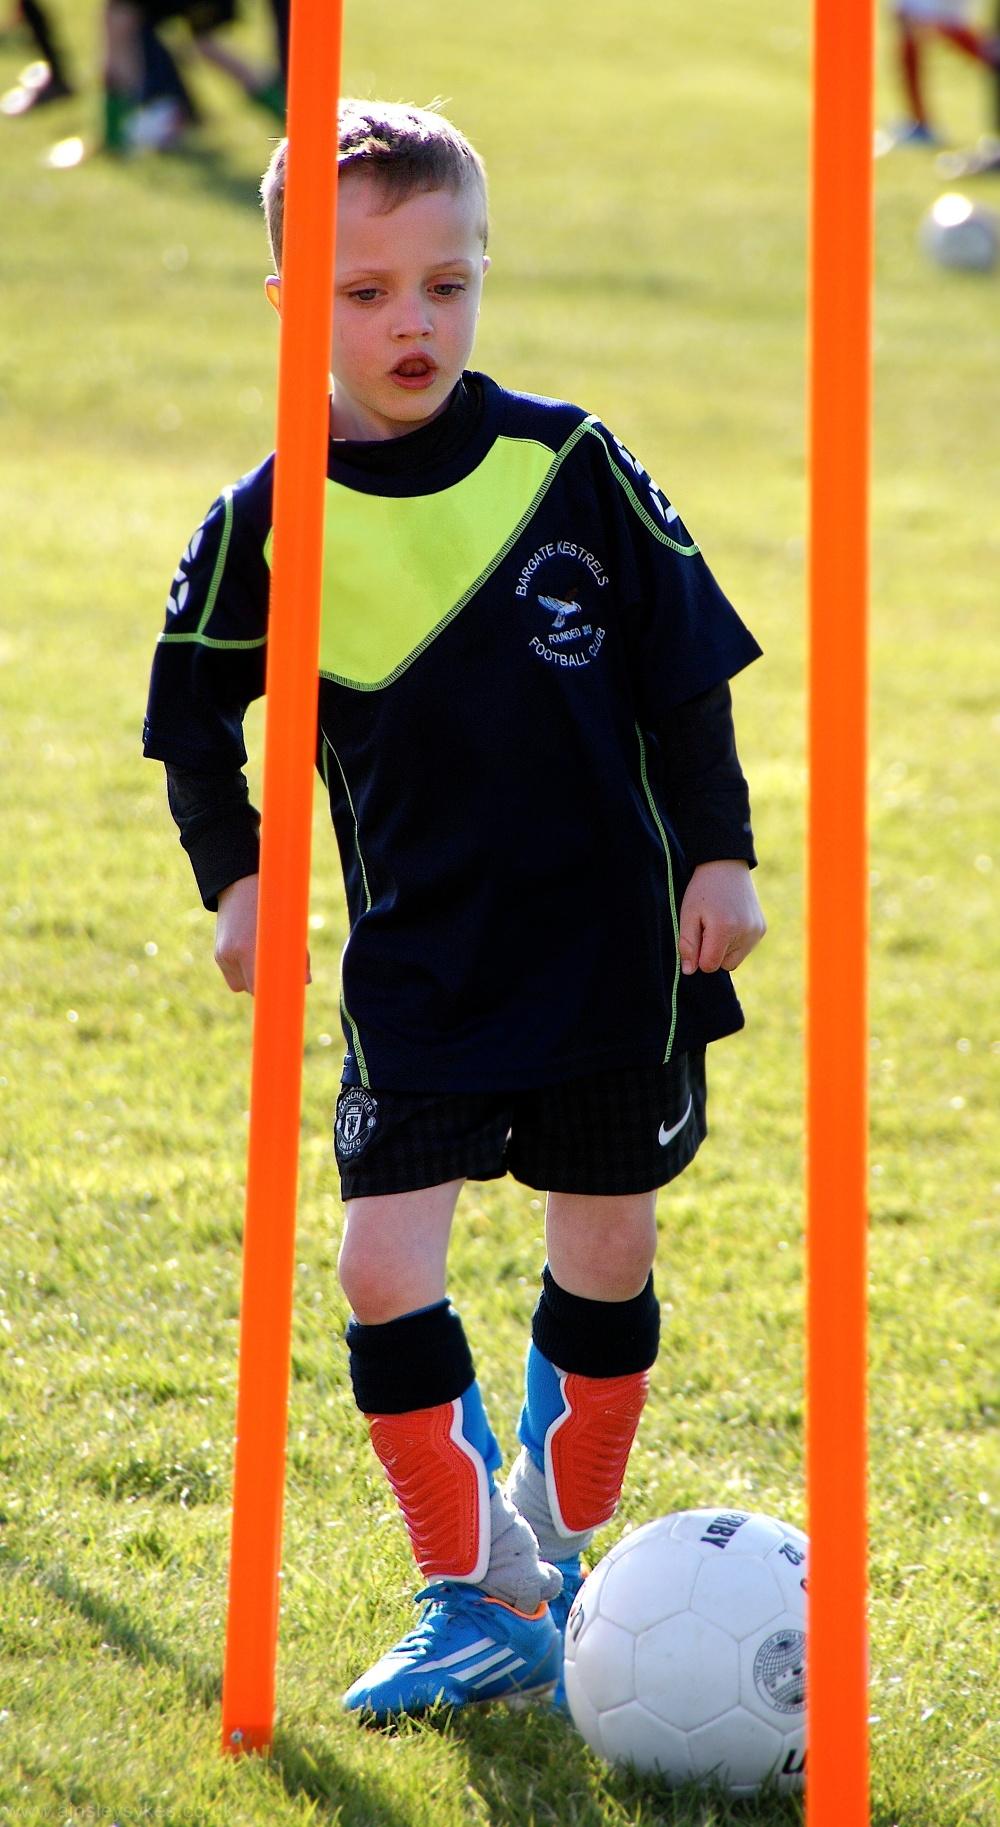 Future Footballer